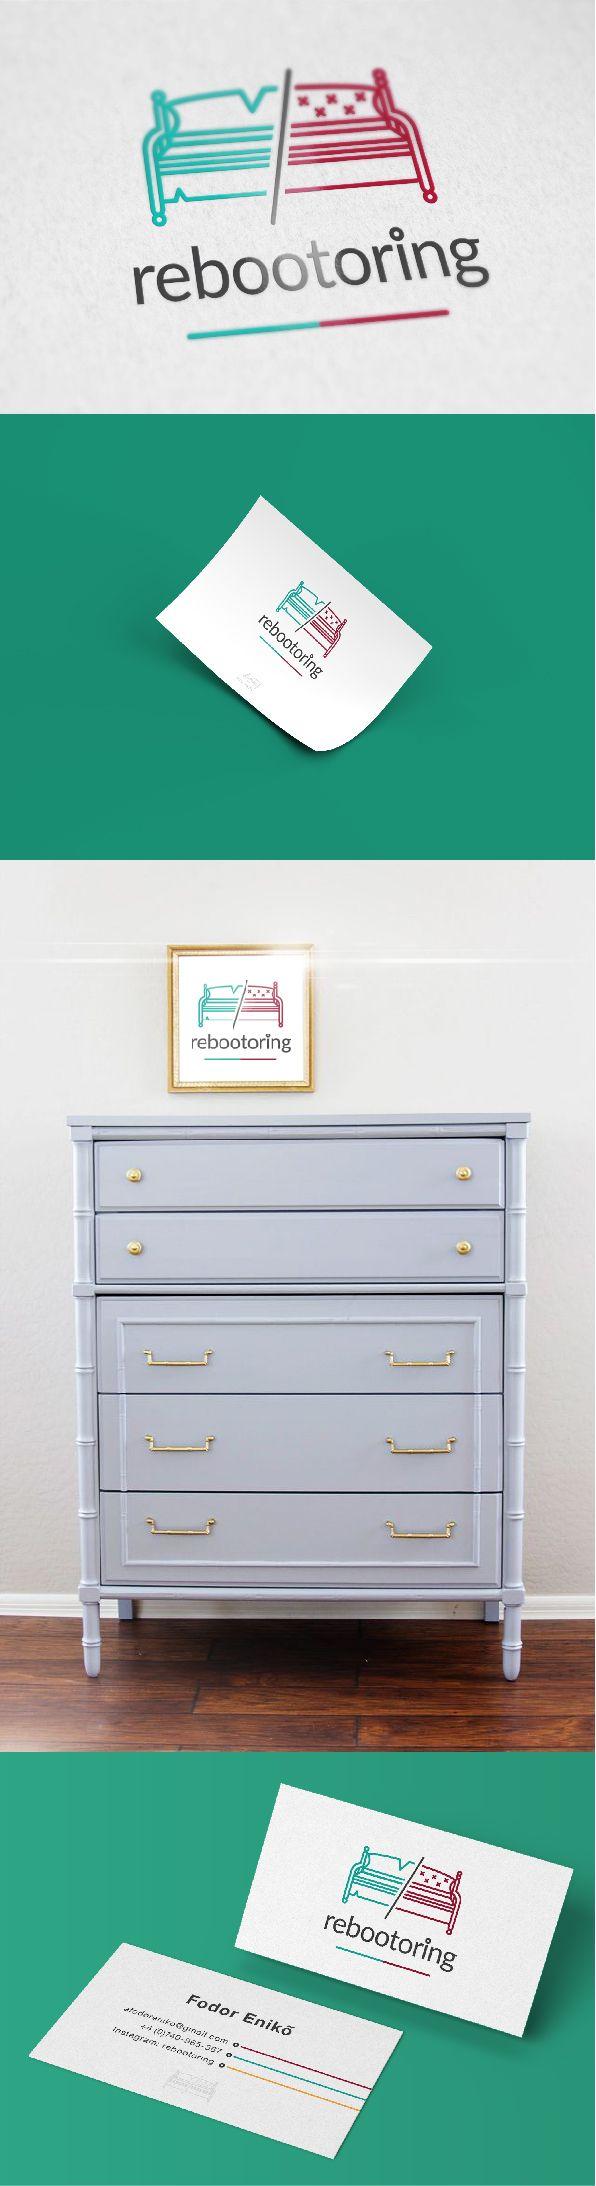 #rebootoring #logo #design #brand #green #red #coach #seat #bench #furniture #recycling